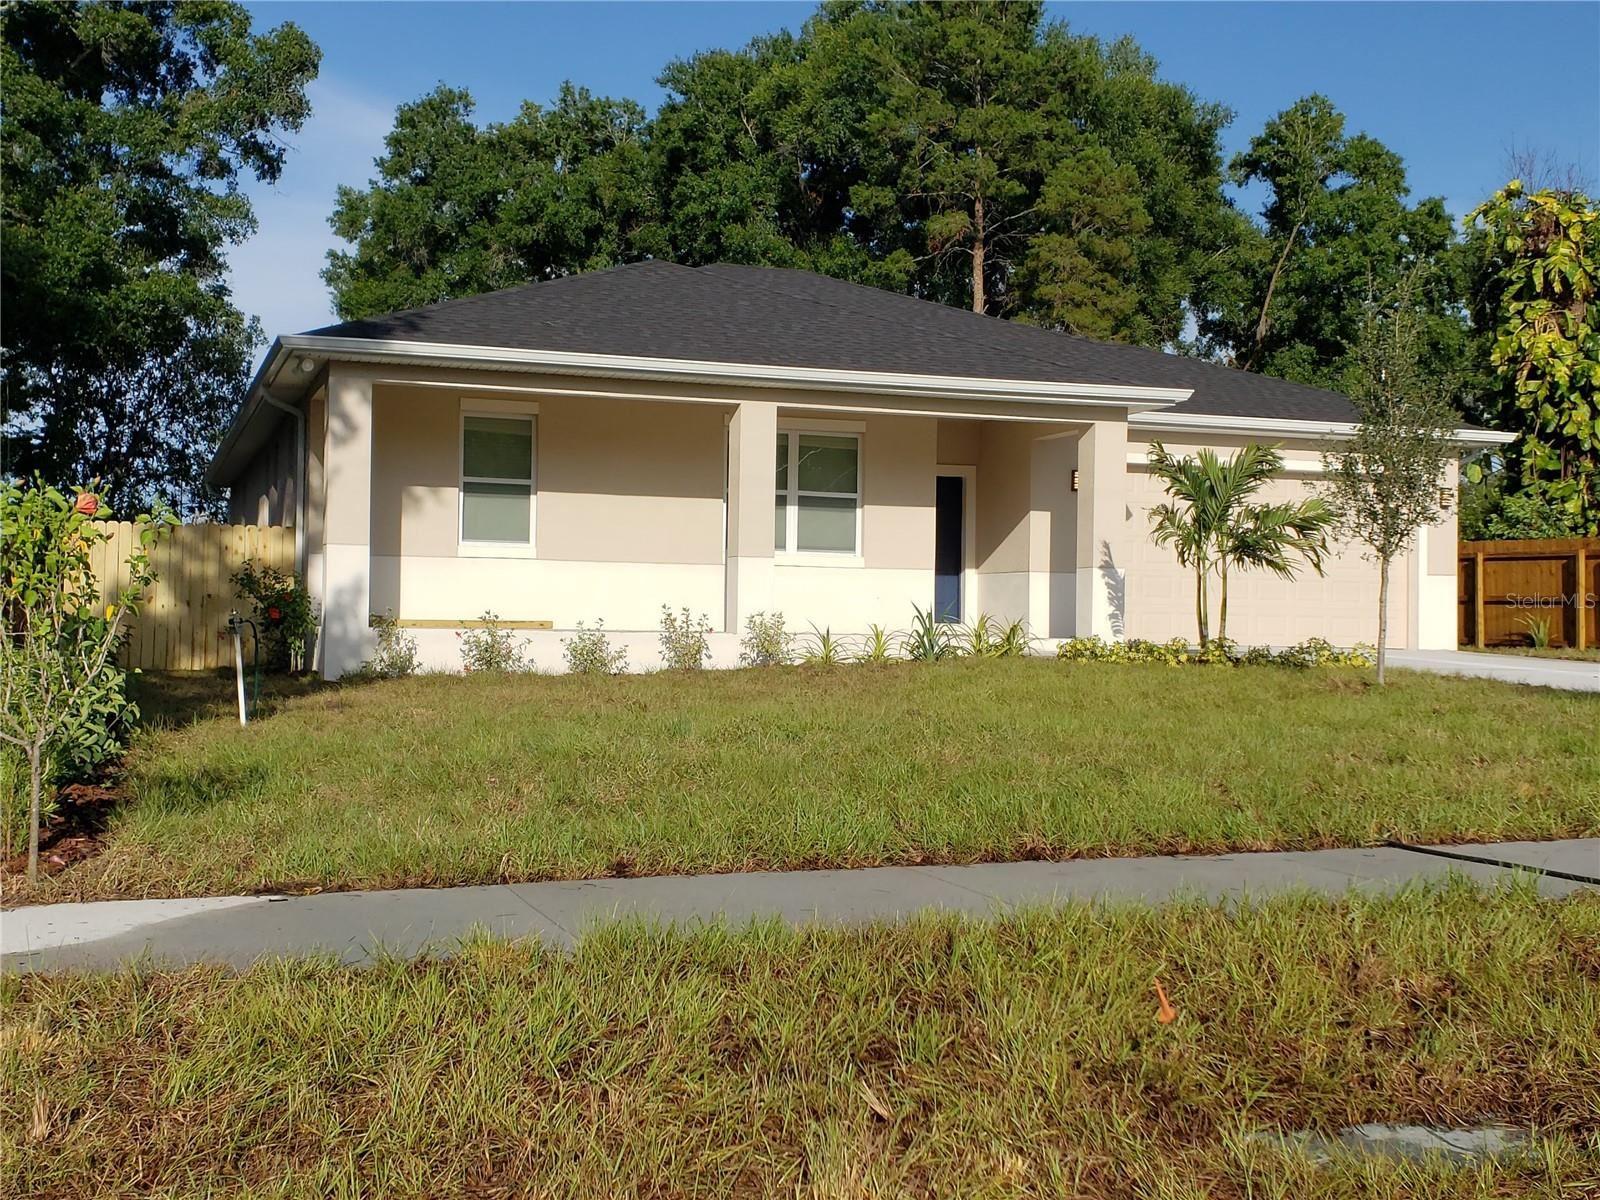 403 MORNINGSIDE DRIVE, Valrico, FL 33594 - MLS#: T3310845